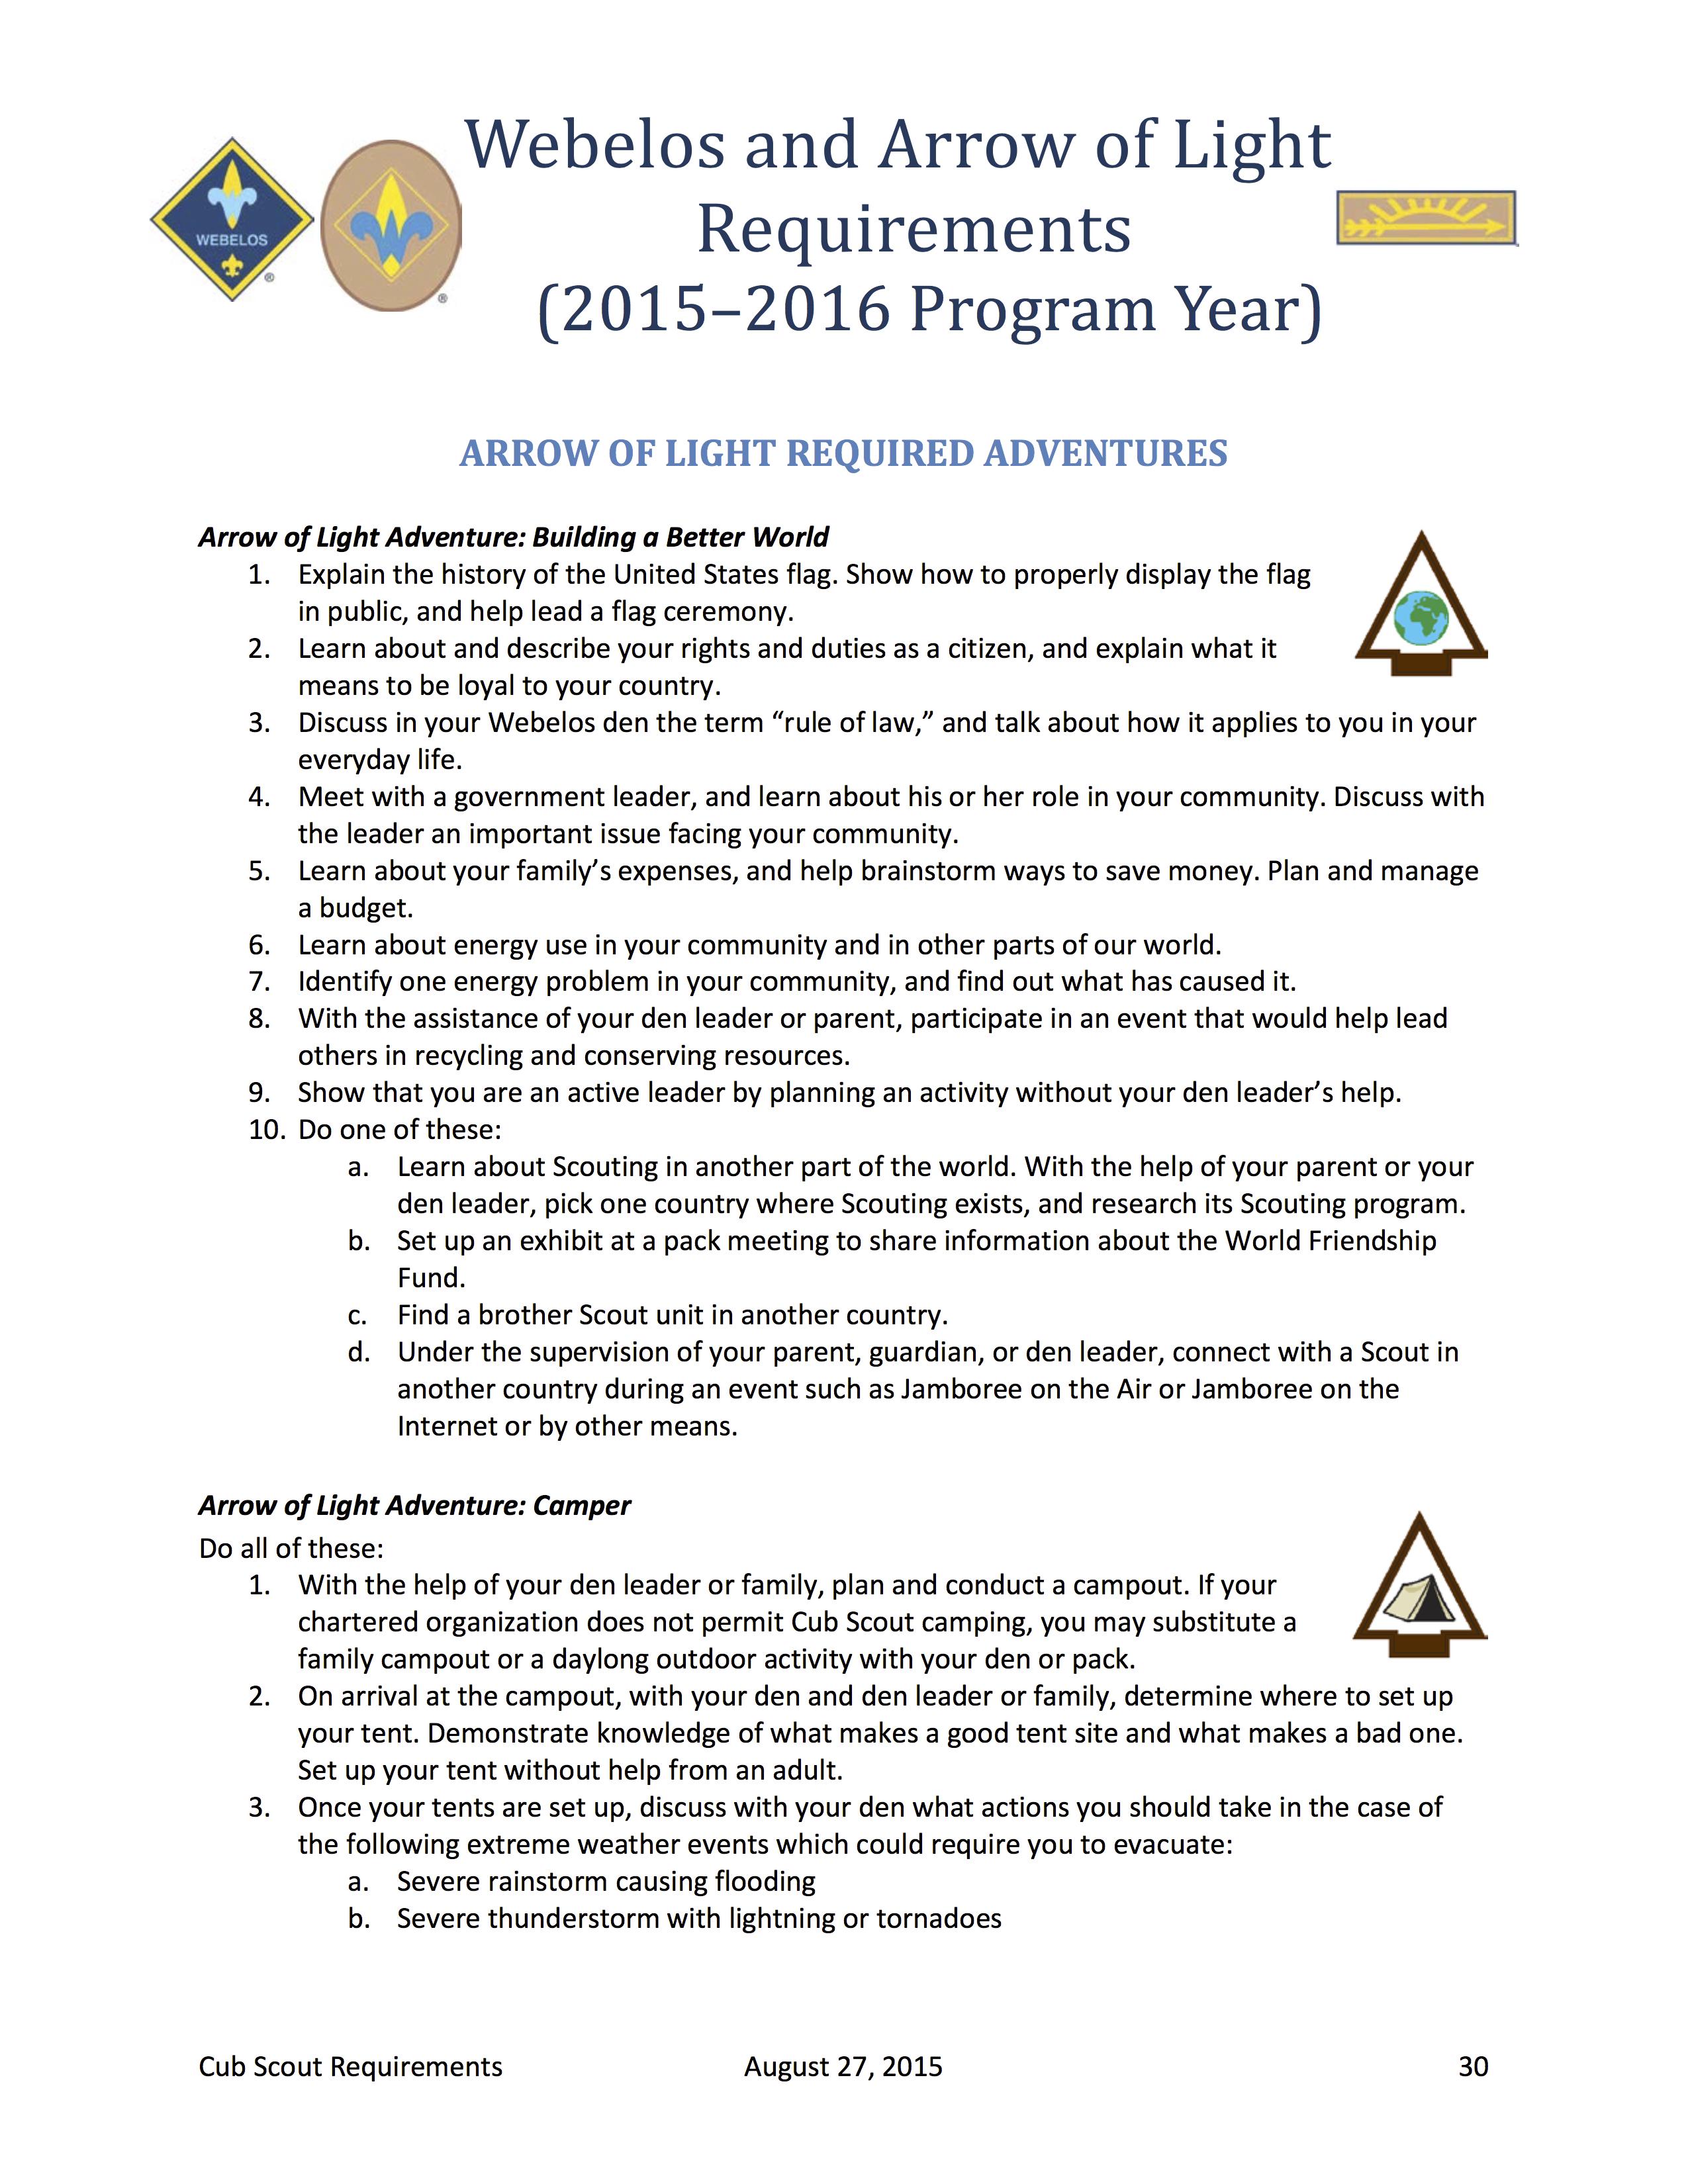 Arrow Of Light Requirements Worksheet